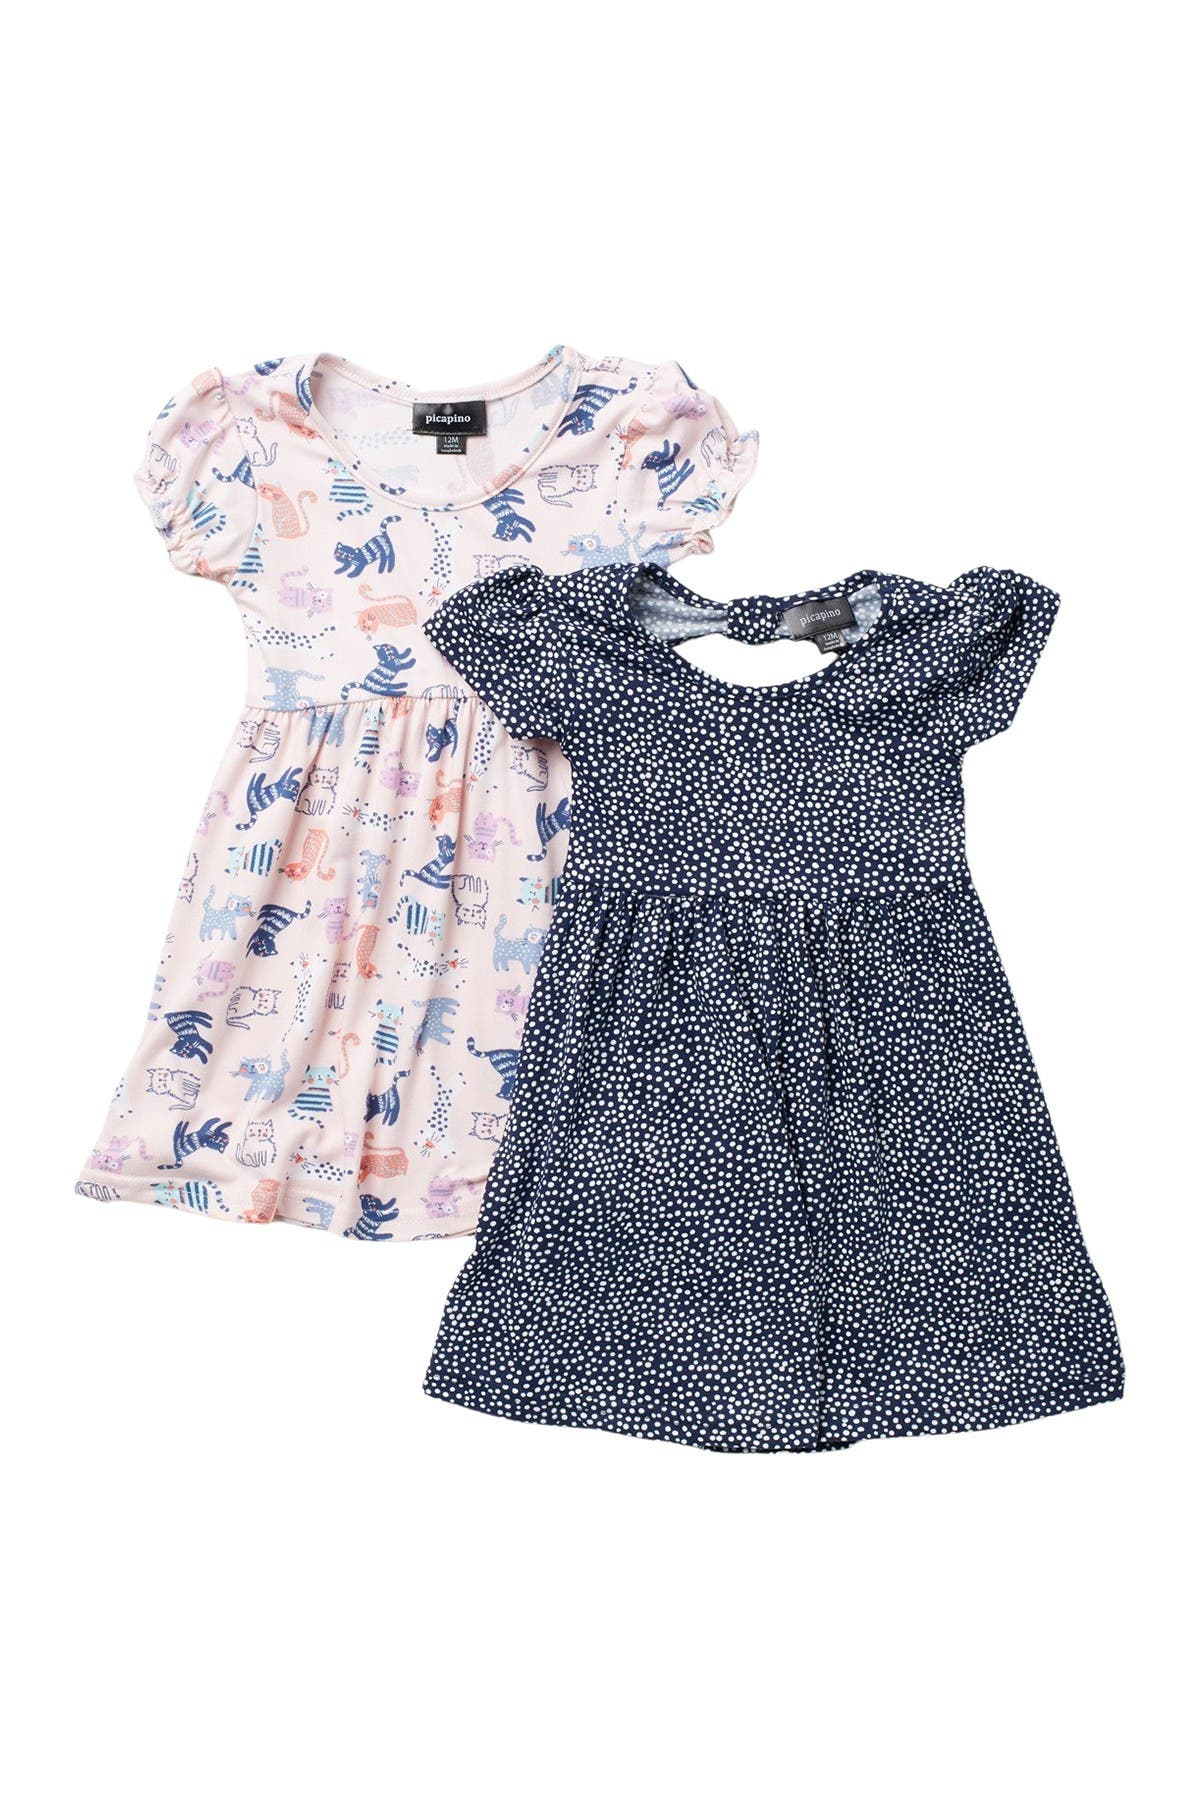 Image of Penelope Mack Short Sleeve Printed Dresses - Set of 2